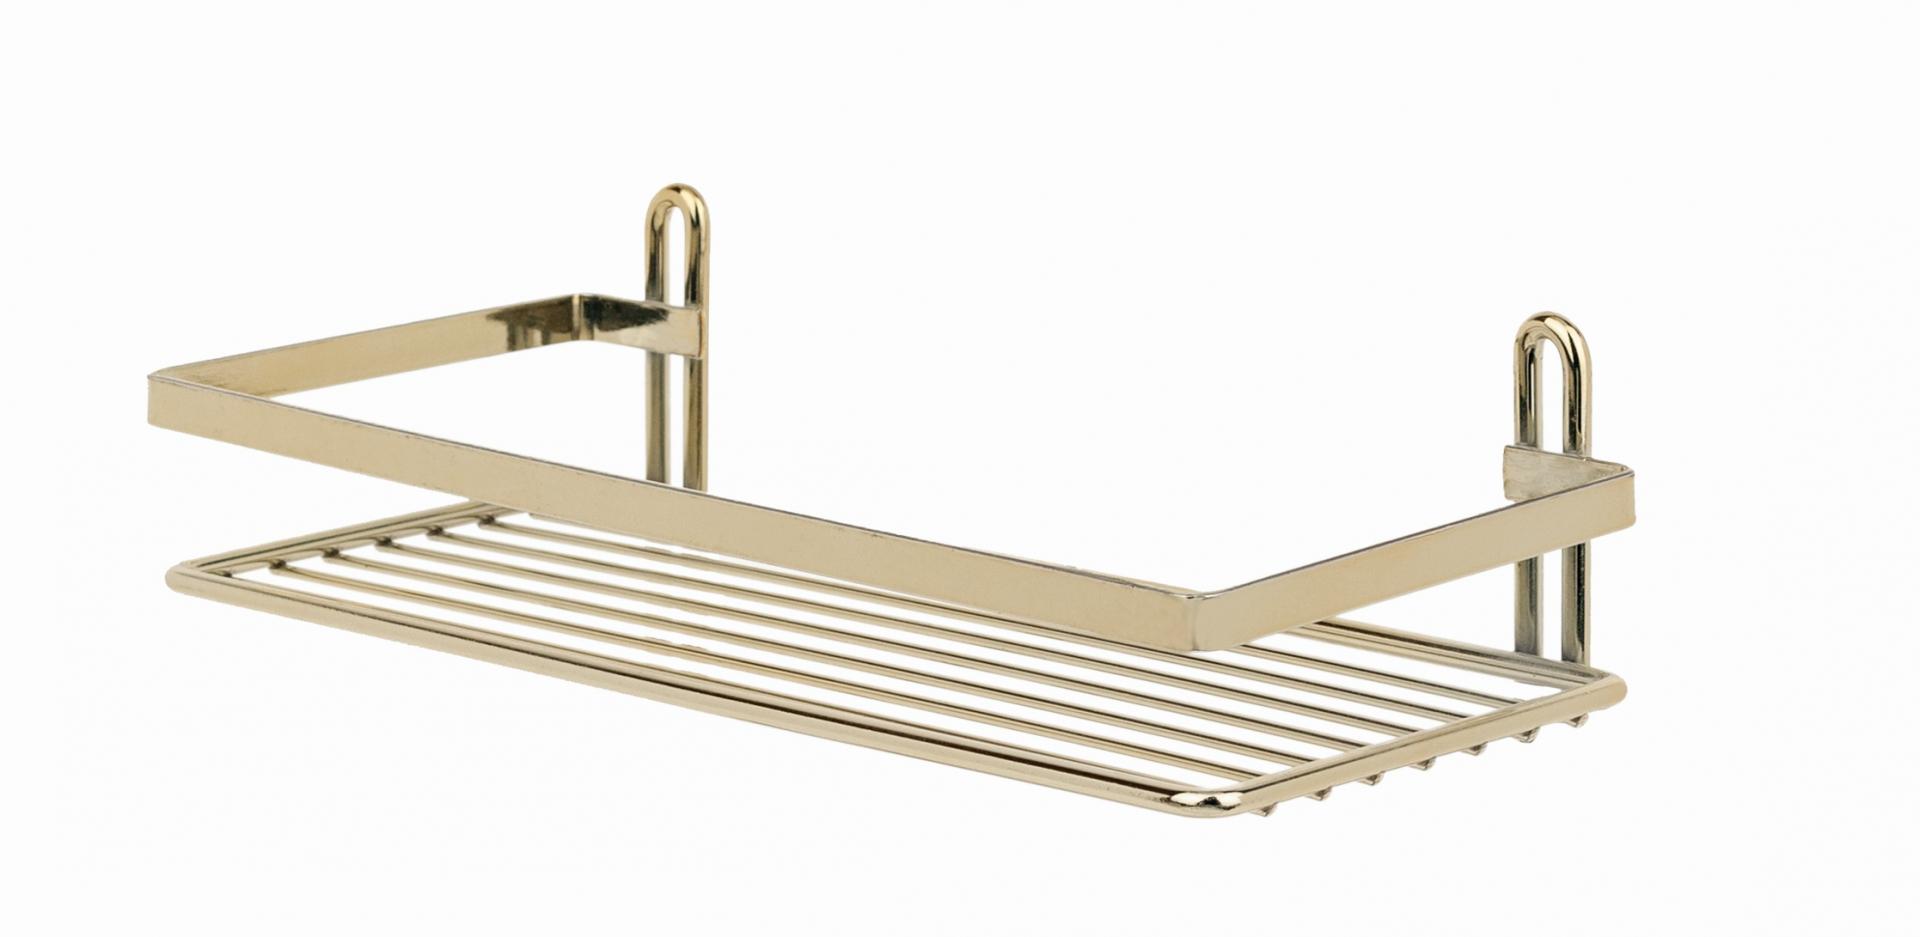 Полка в ванную TEKNO-TEL прямая ES081G 1 ярус 25х12х6 по цене 894